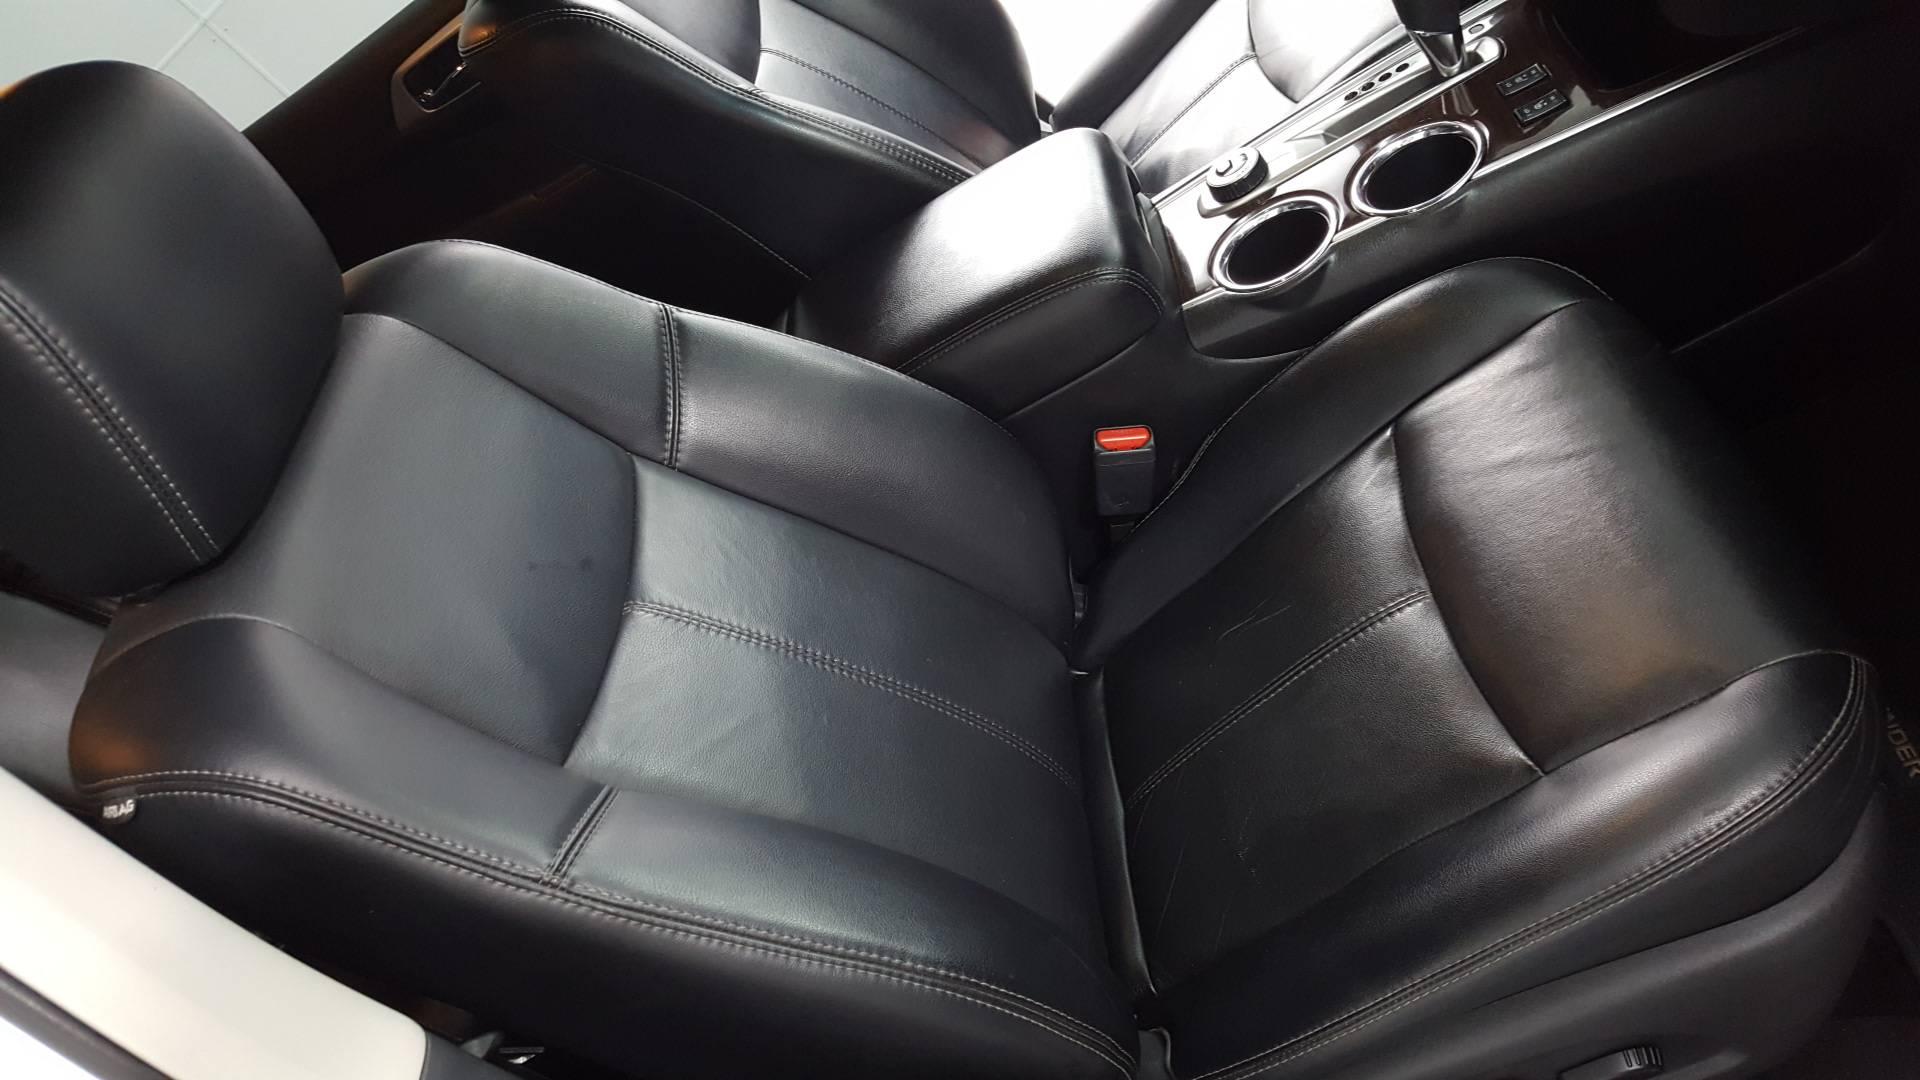 2015 Nissan Pathfinder Sport Utility